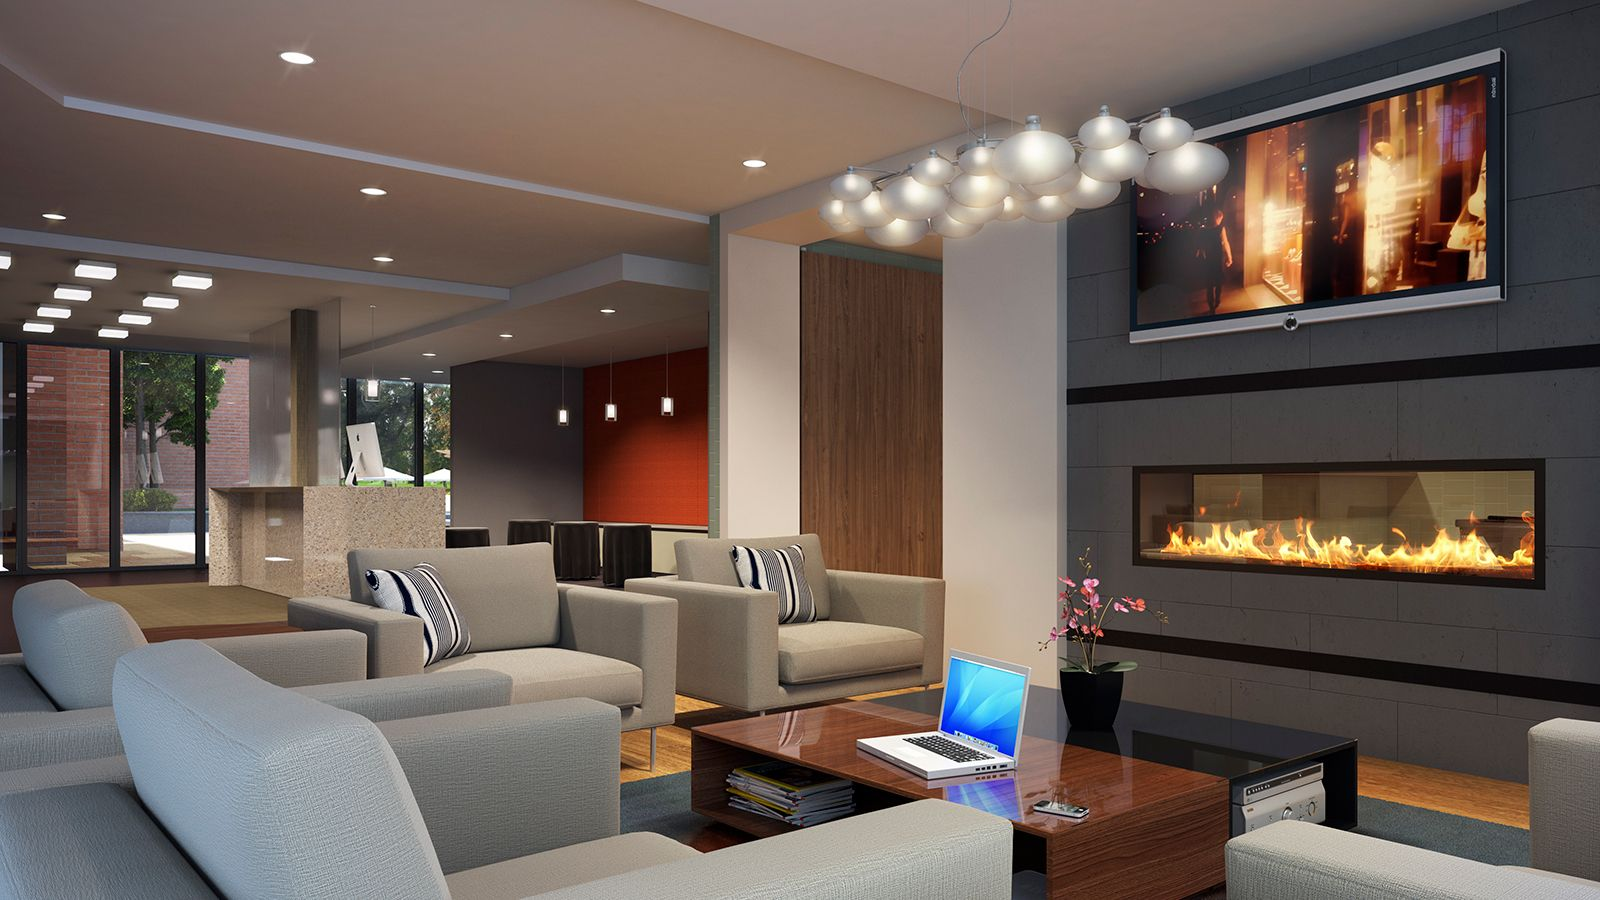 New Cambridge Ma Luxury Apartments Apartments In Cambridge Atmark Luxury Apartments Home Comfy Seating